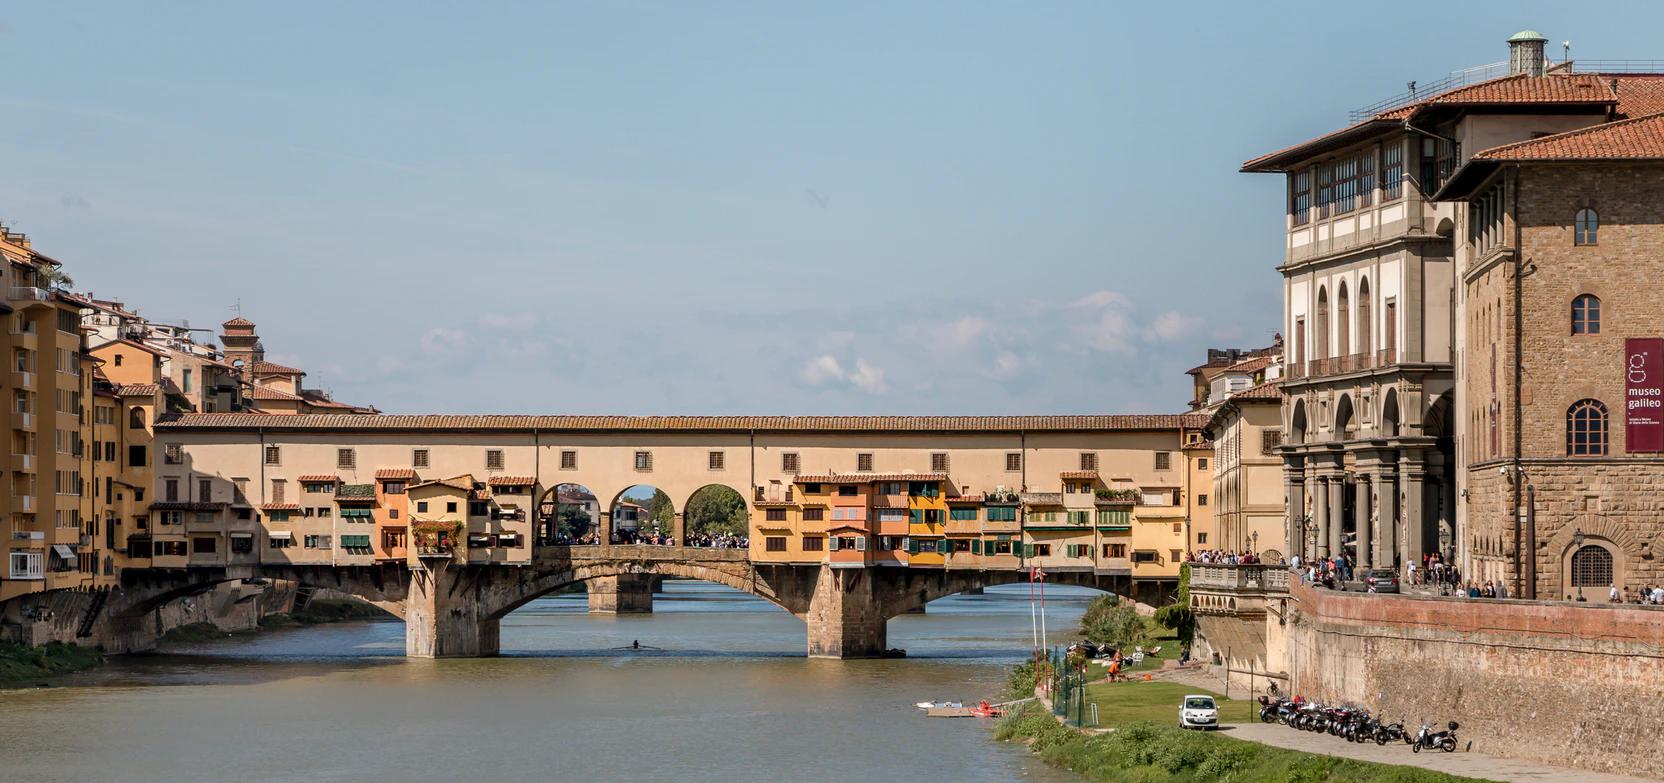 Photo of the Ponte Vecchio bridge in Florence